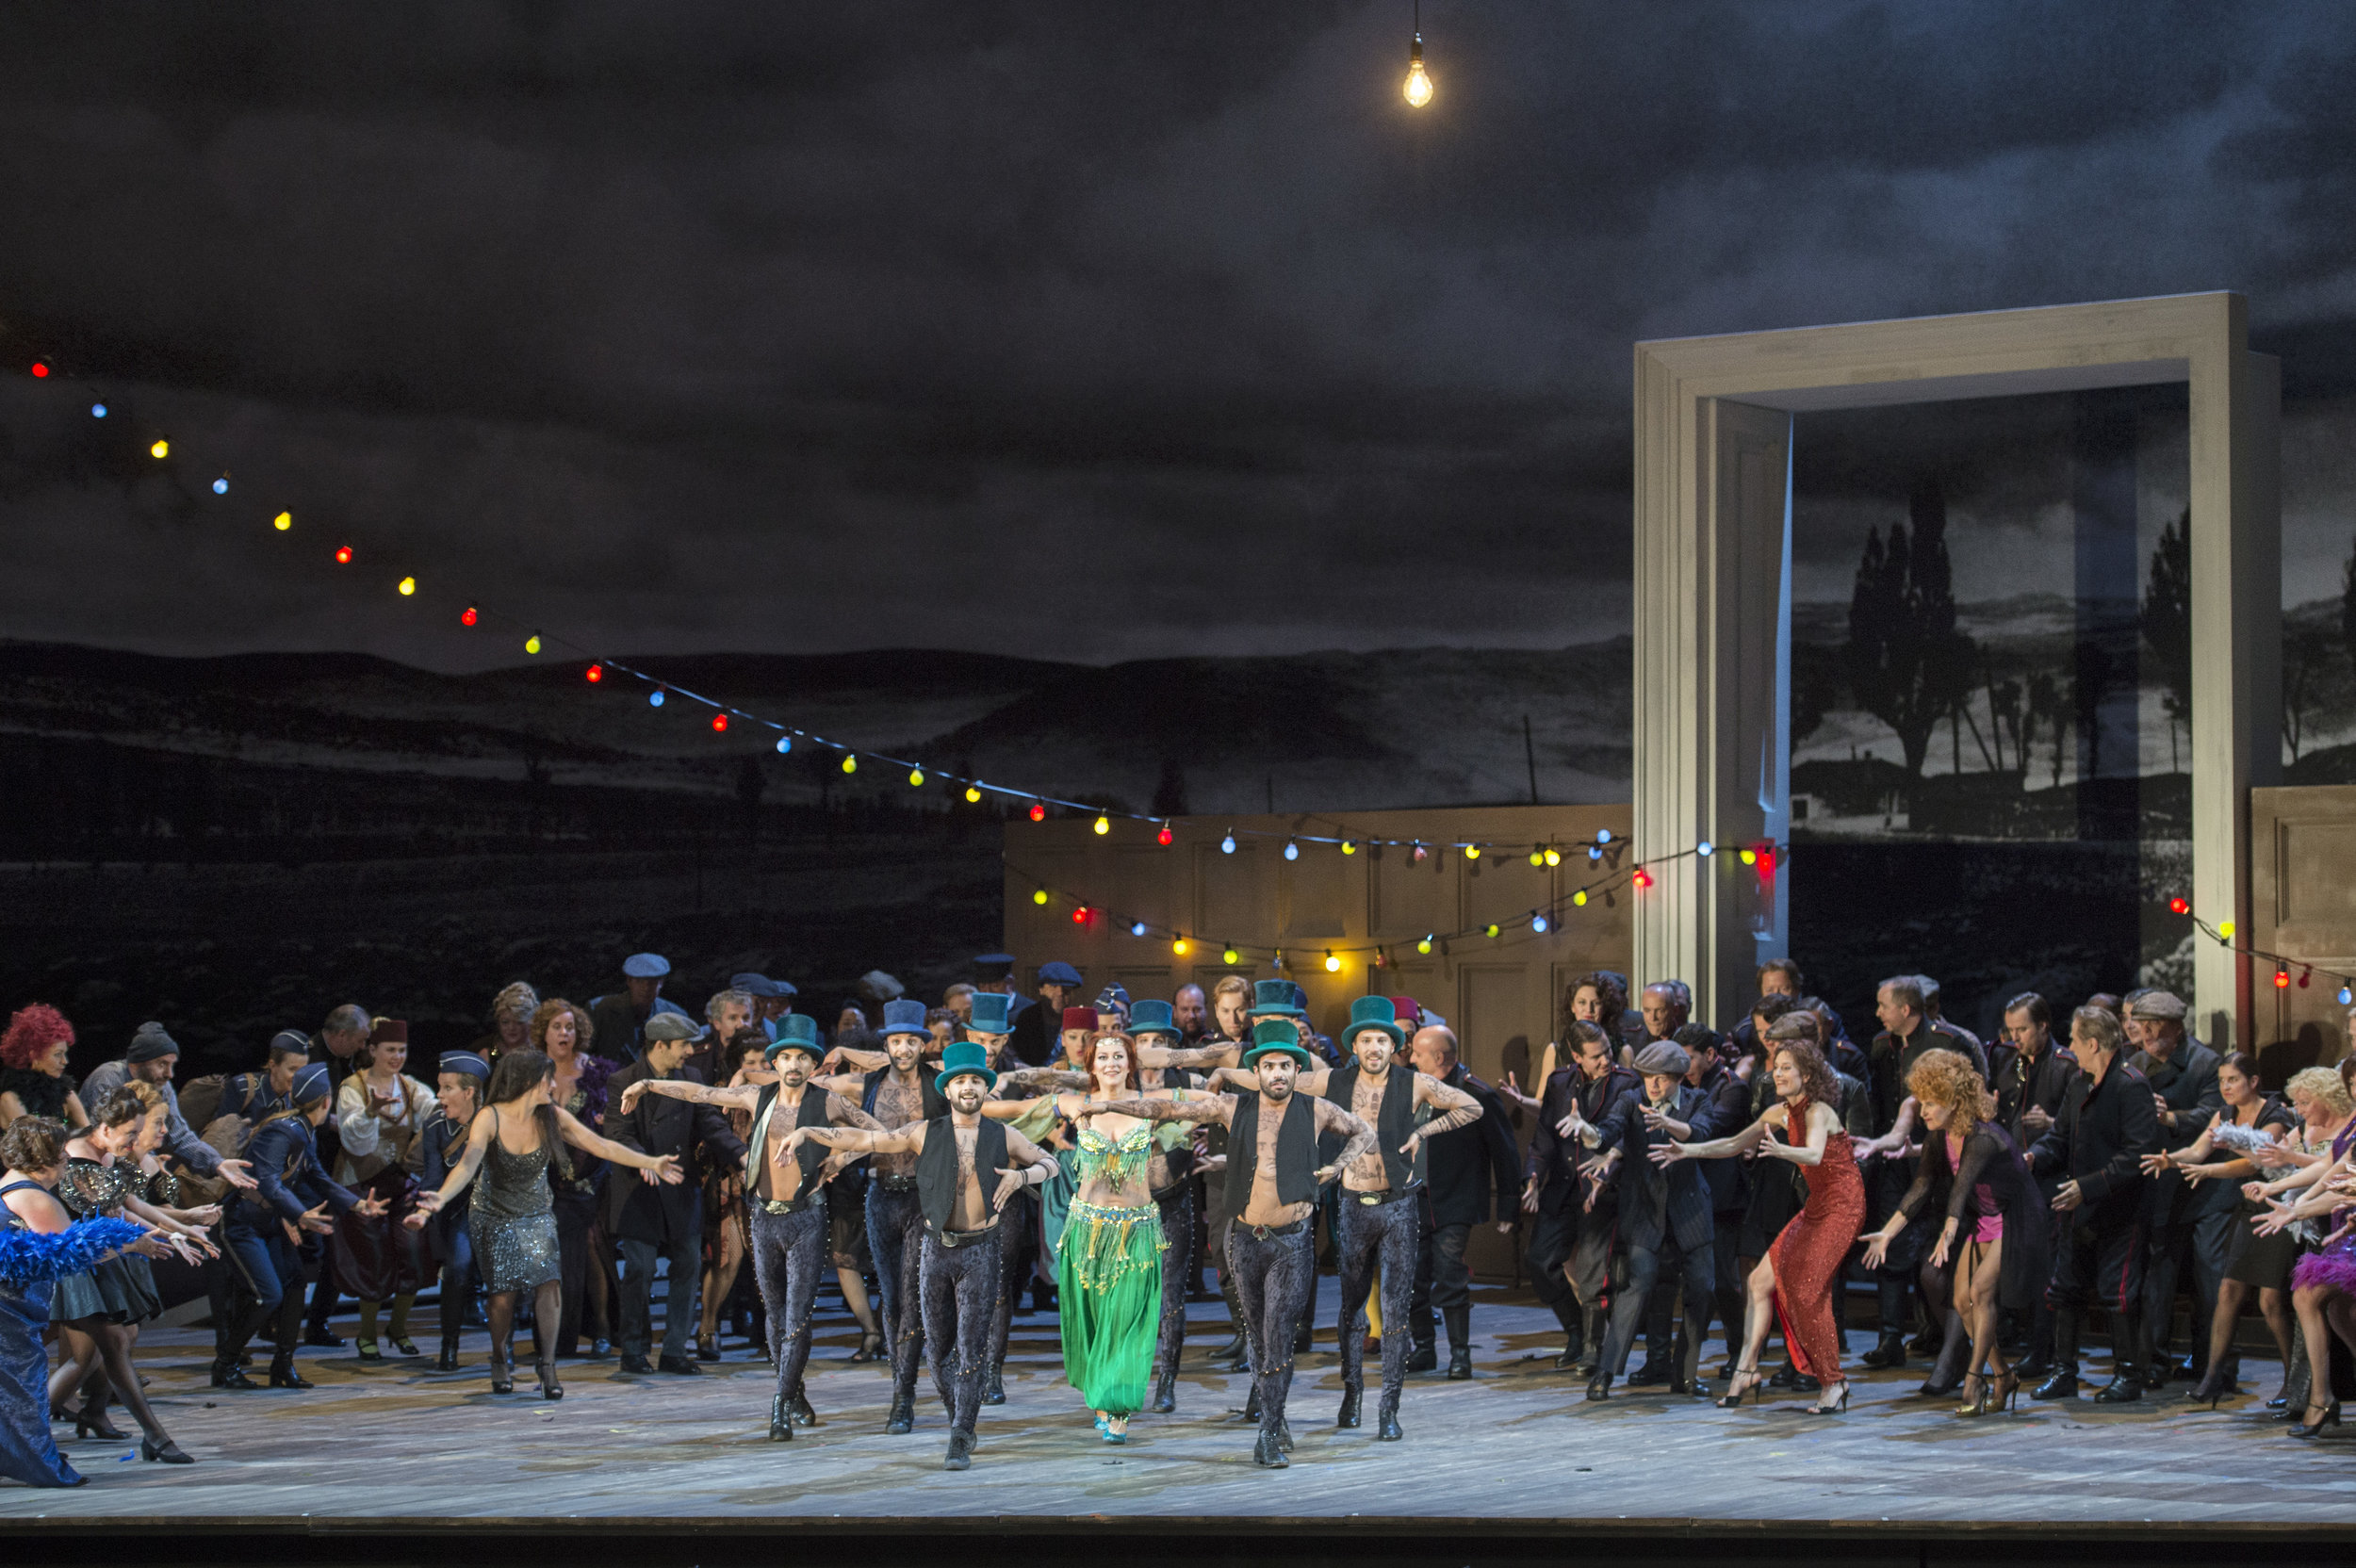 forza_346 La forza del destino at Dutch National Opera (C) Monika Rittershaus.jpg